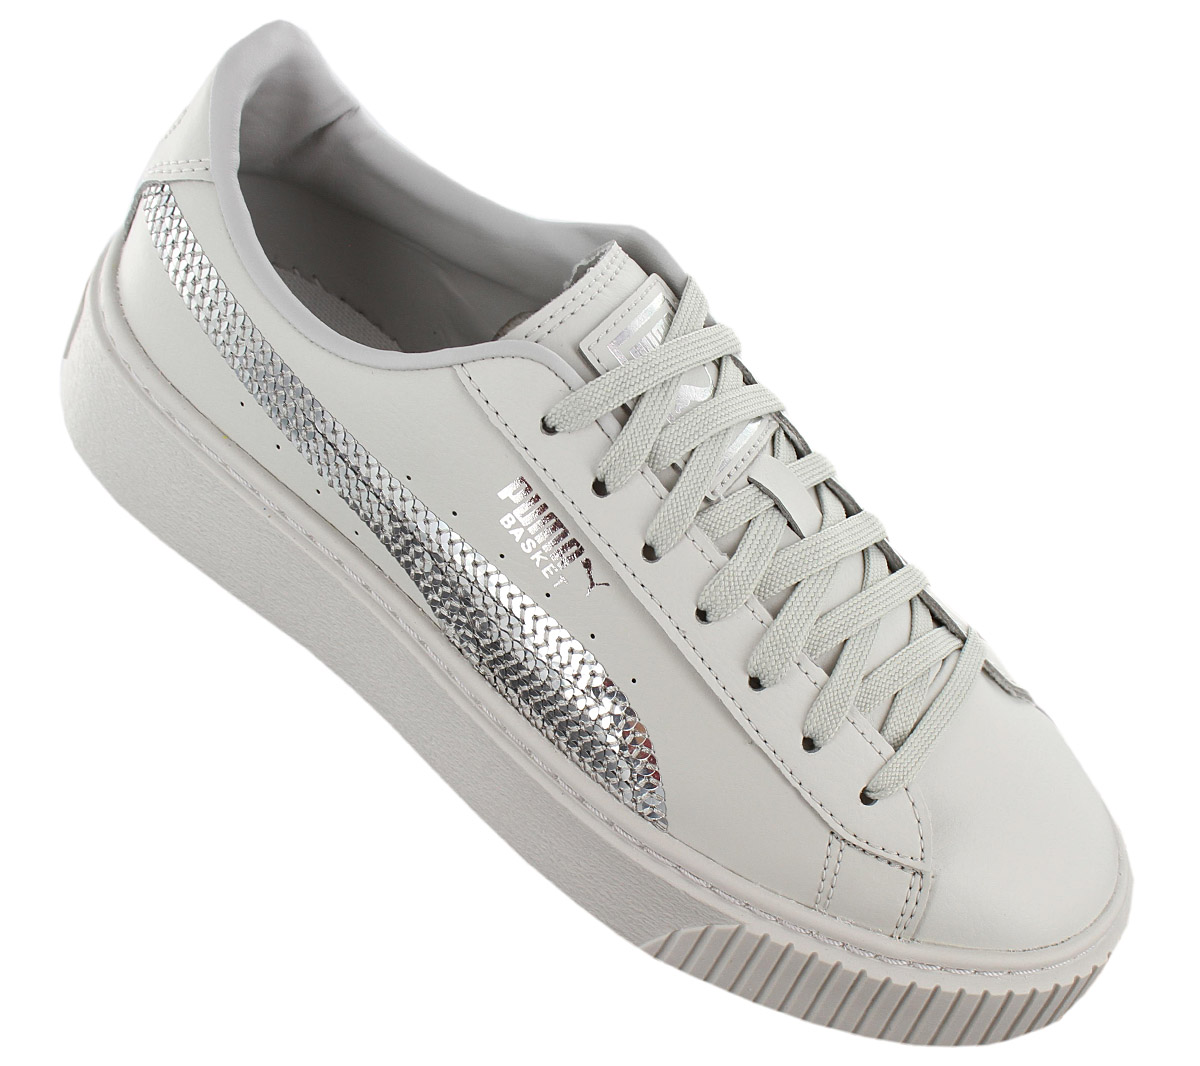 eaba546bd4 Puma Platform Basket Bling Sneaker Women Plateau Shoes 367237-02 ...